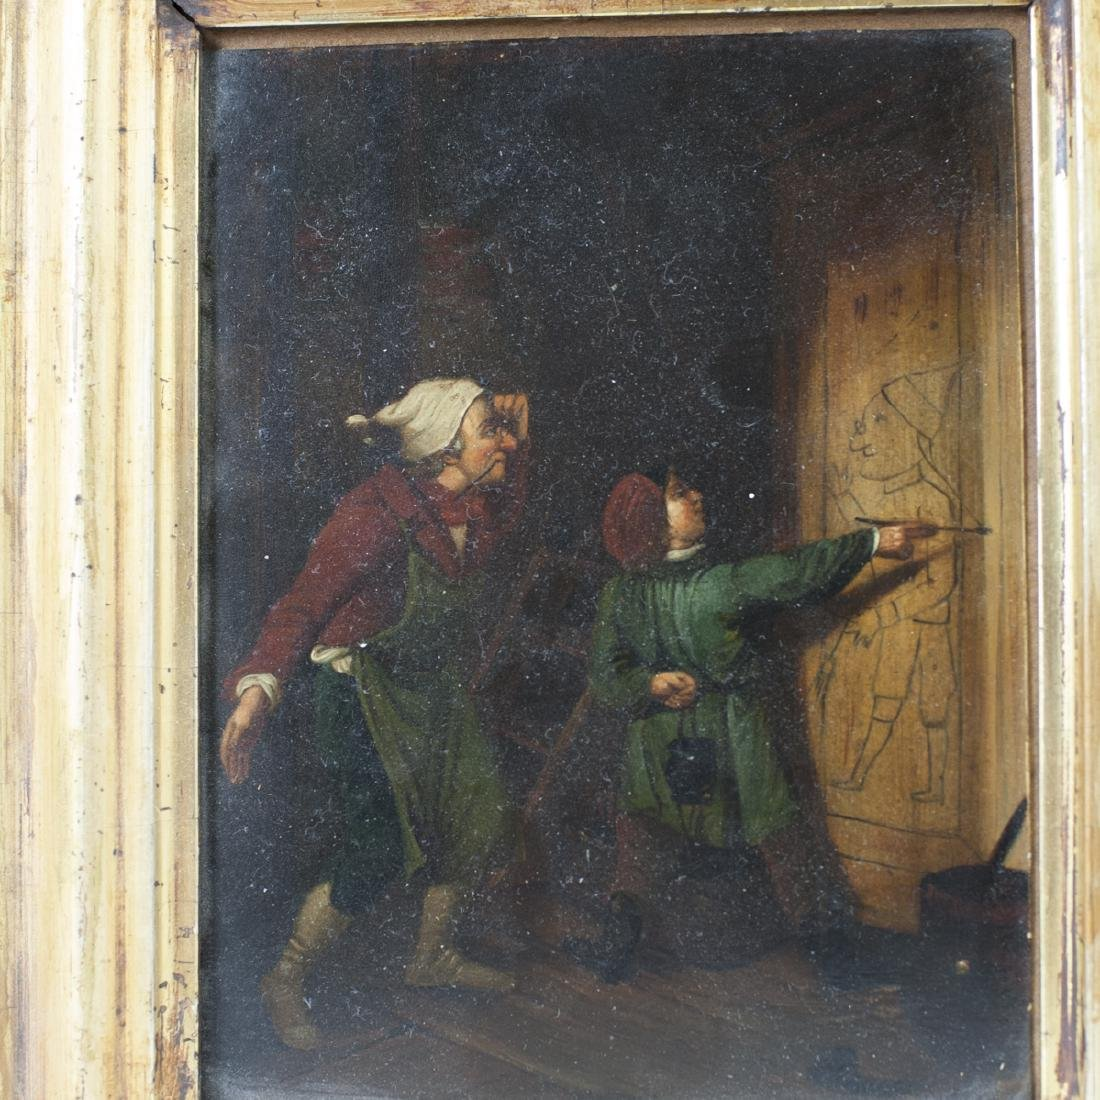 Antique Dutch Oil on Copper Paintings - 3